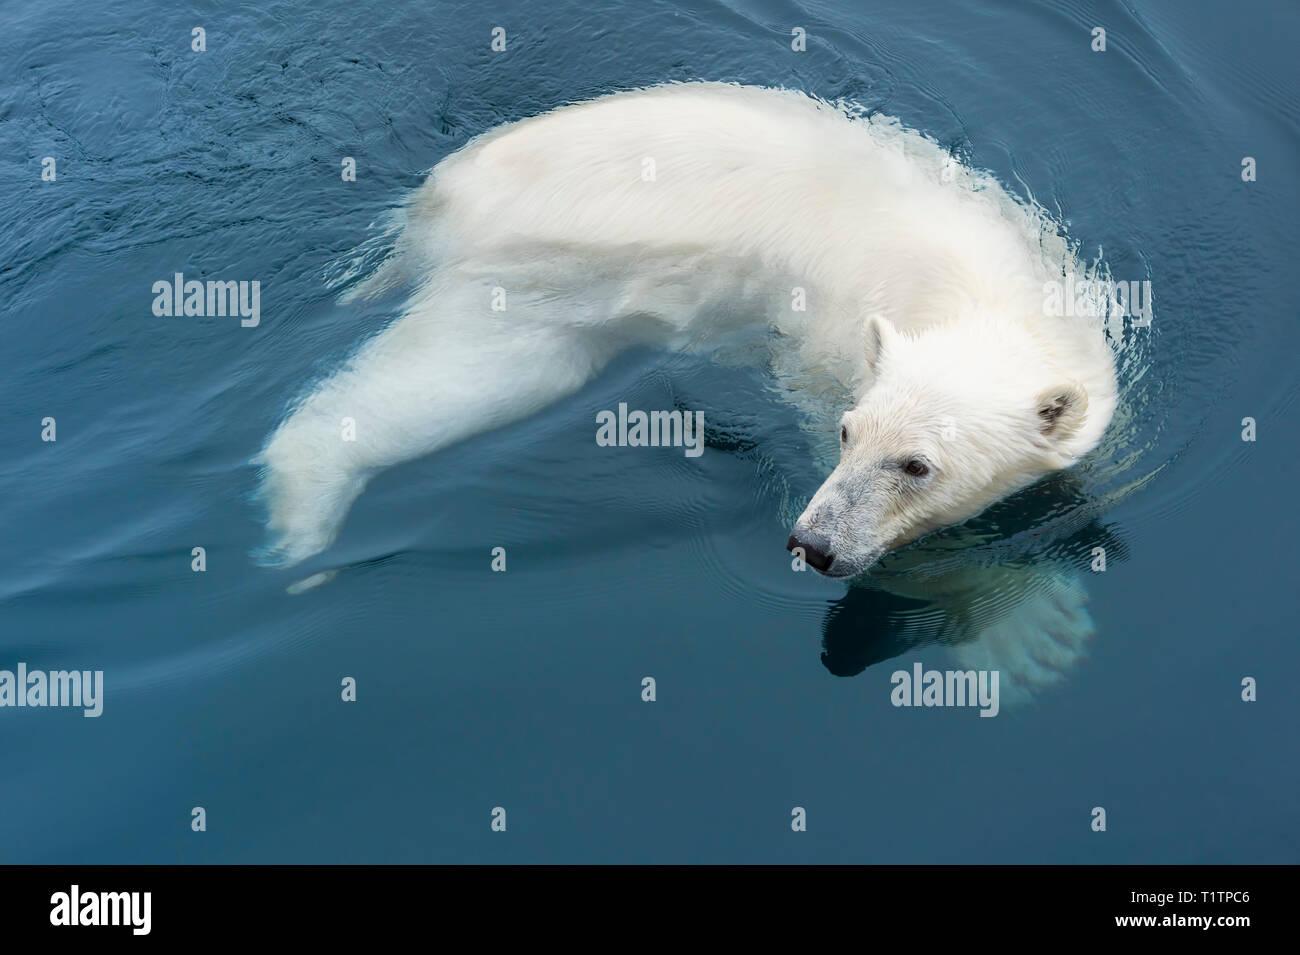 Polar Bear (Ursus maritimus) swimming, Svalbard Archipelago, Norway - Stock Image